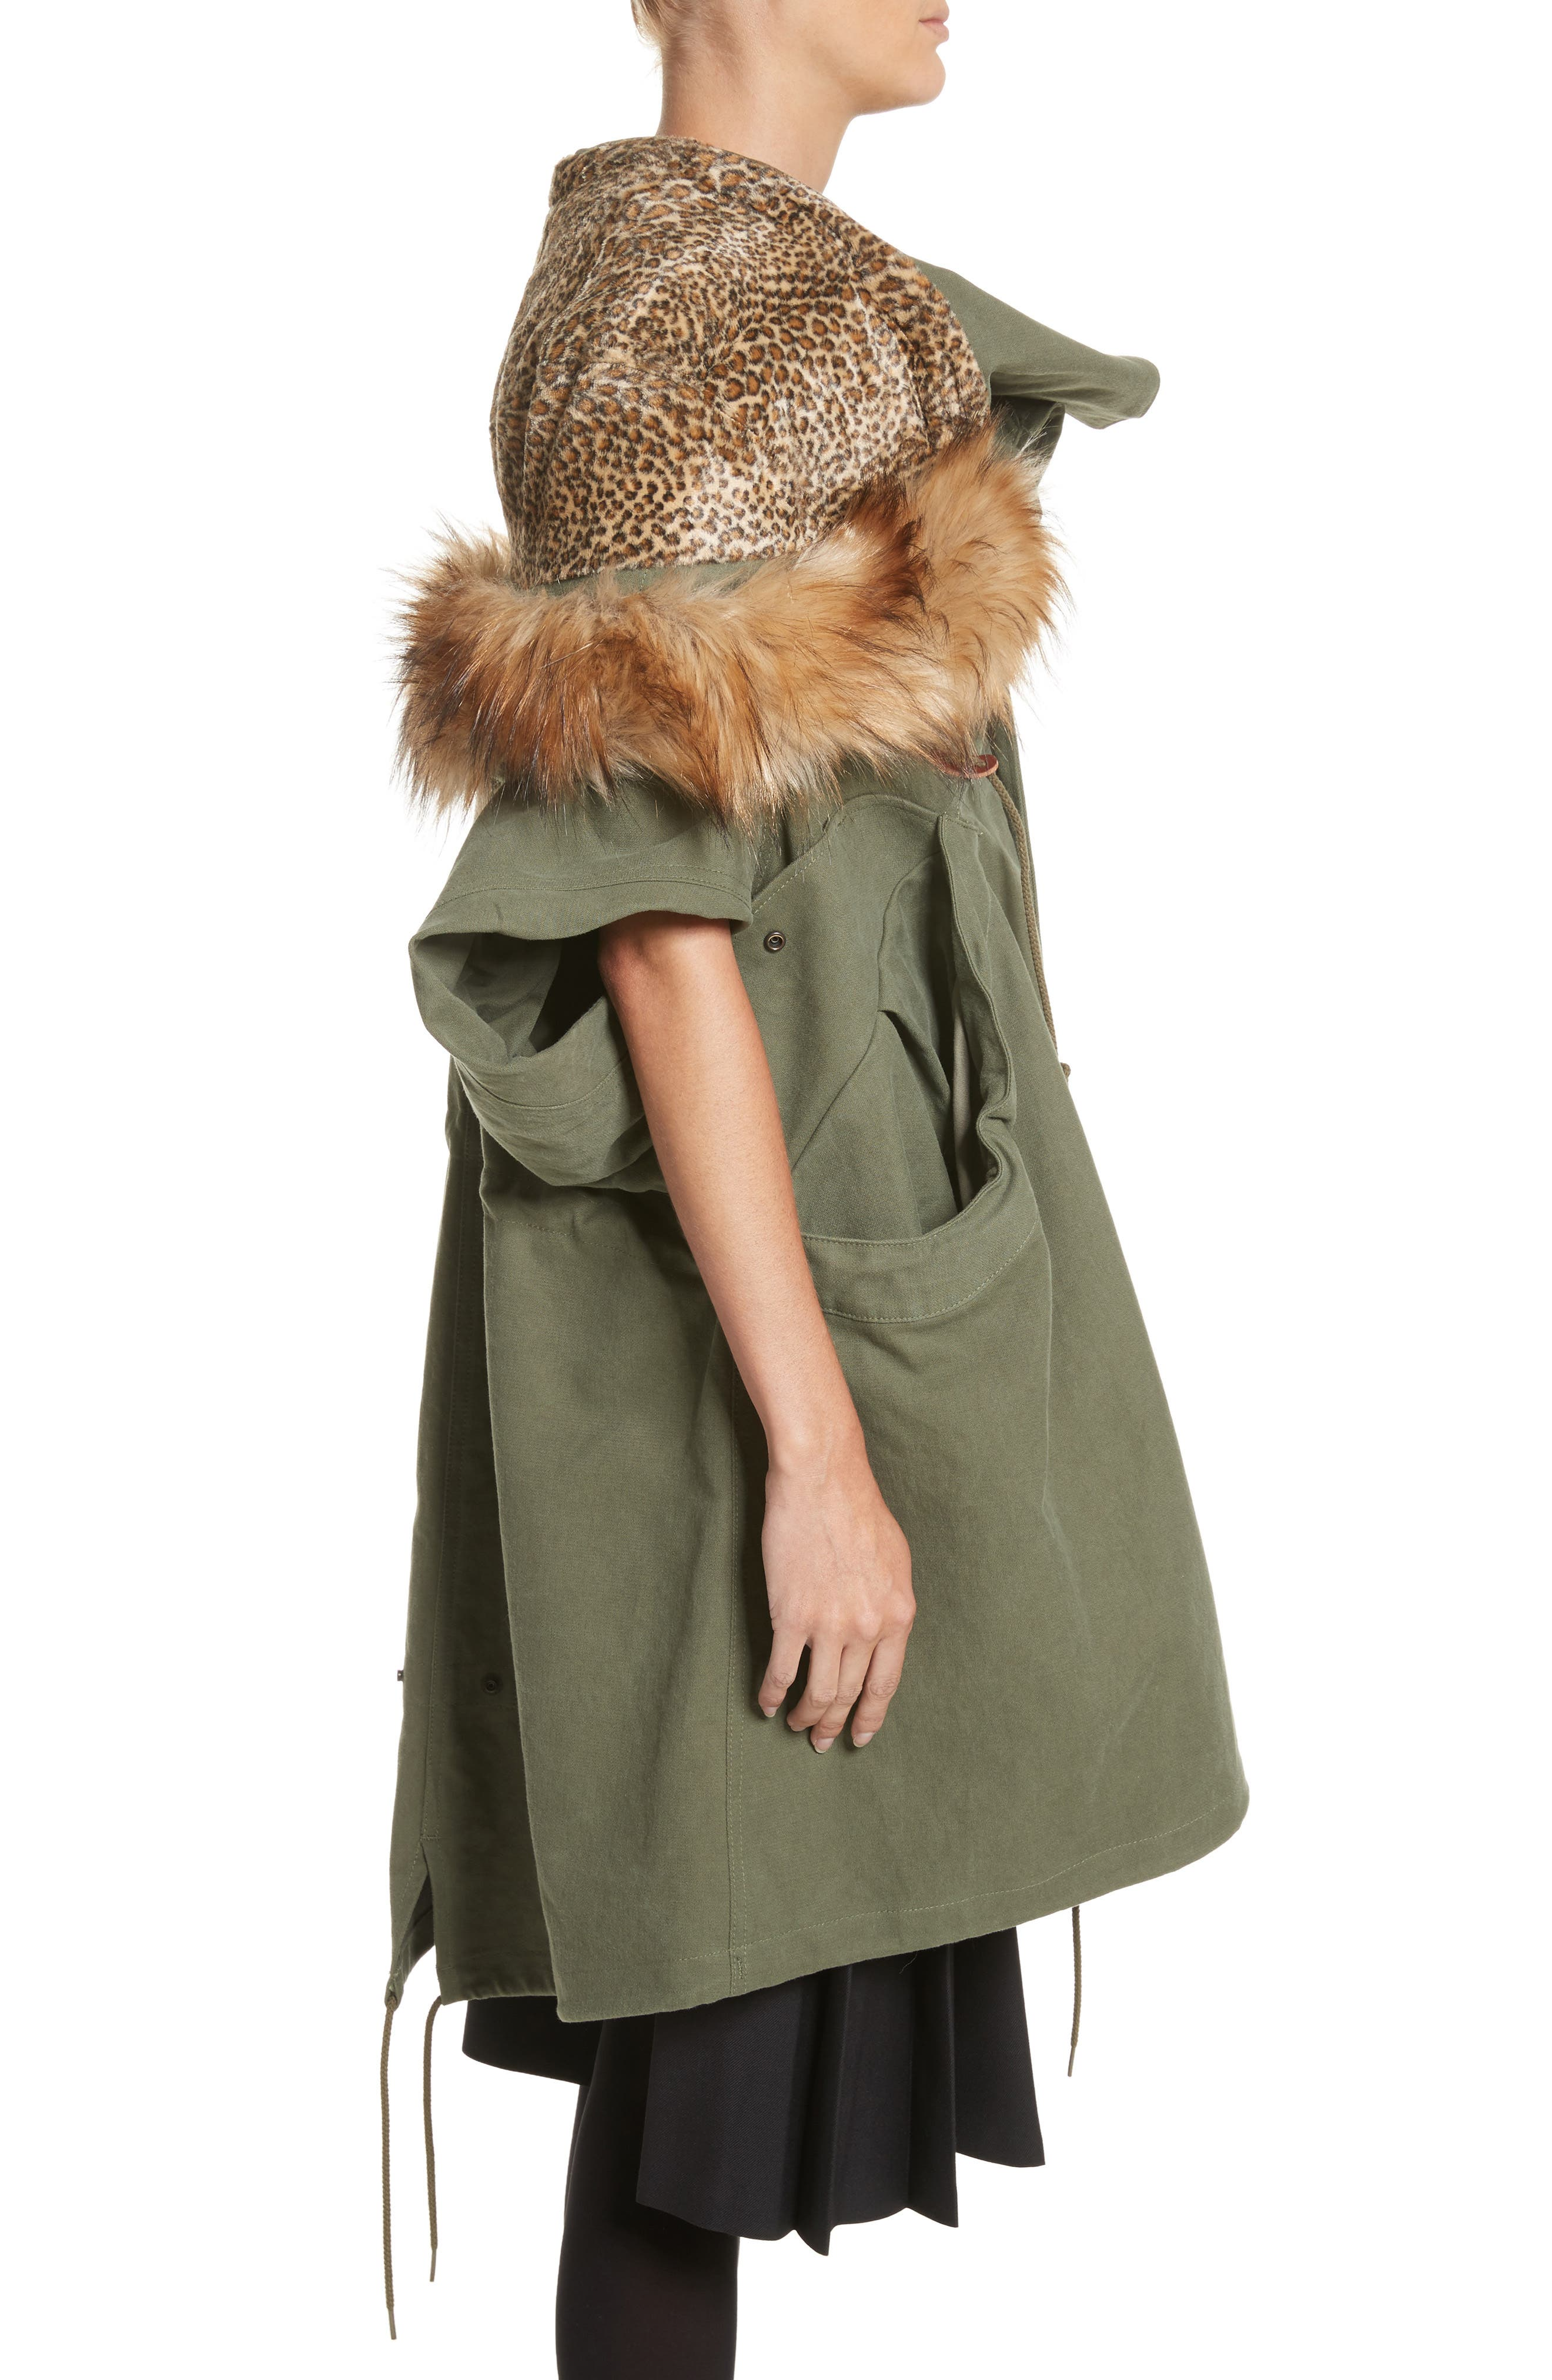 Army Coat with Cheetah Faux Fur Hood,                             Alternate thumbnail 3, color,                             340